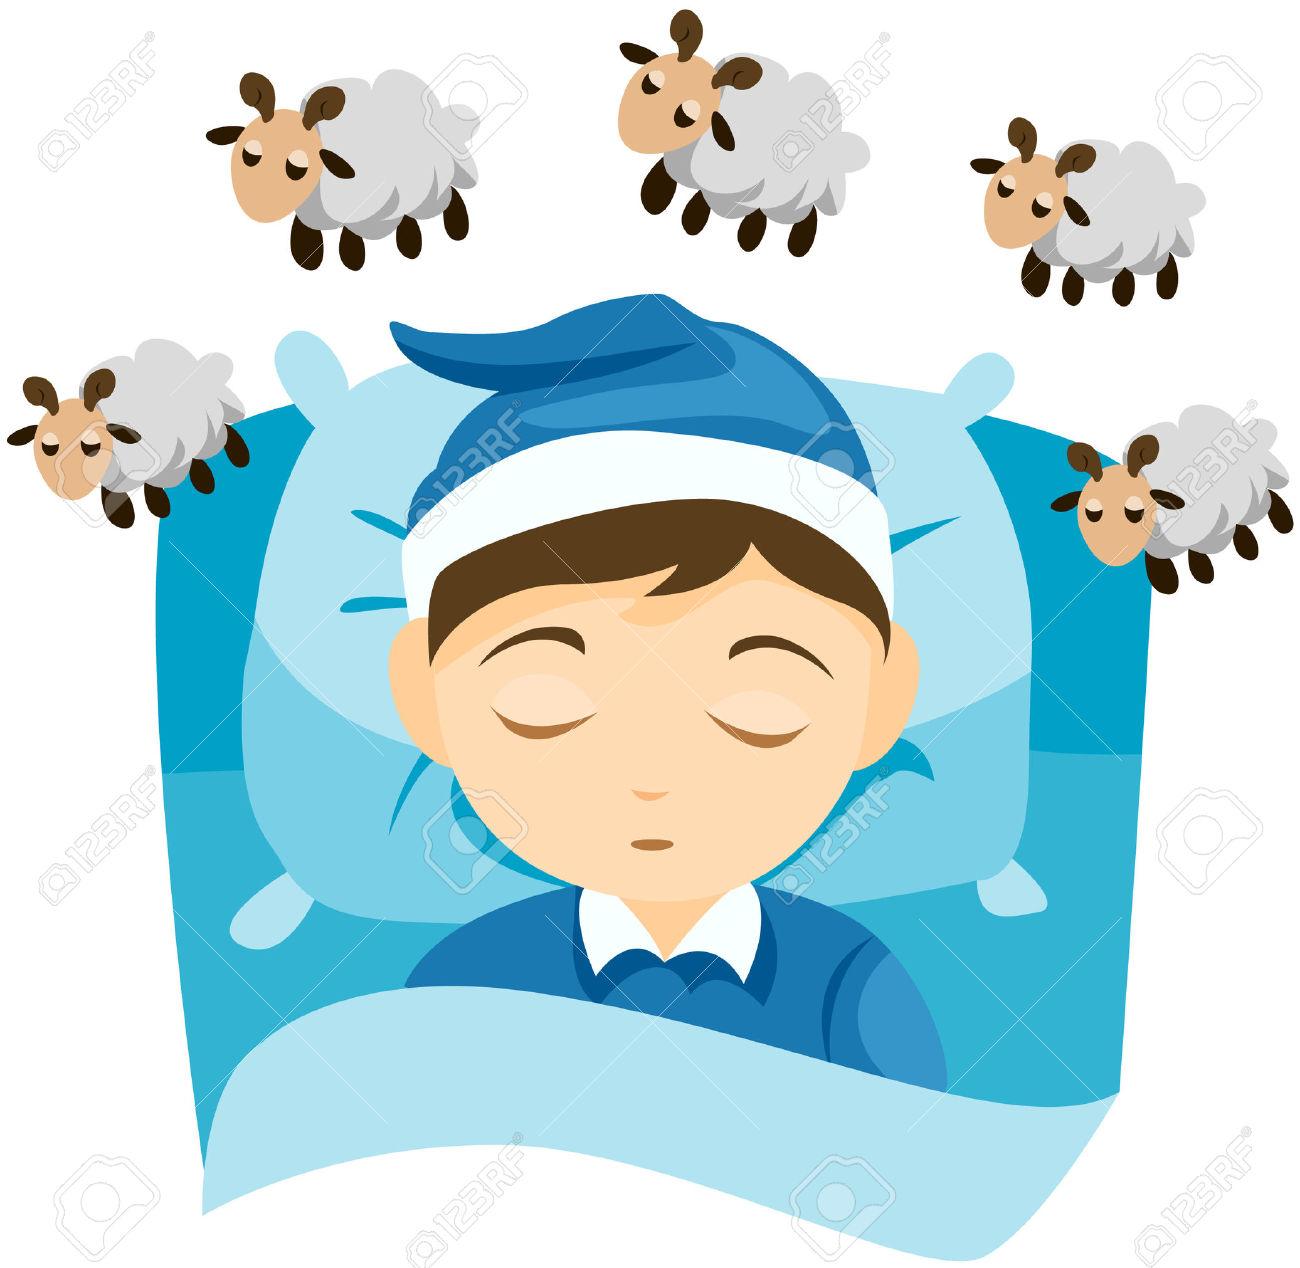 5815d3287abed65bcc054fd597e45644_kid-sleeping-trying-to-sleep-sheep-sleeping-clipart_1300-1268